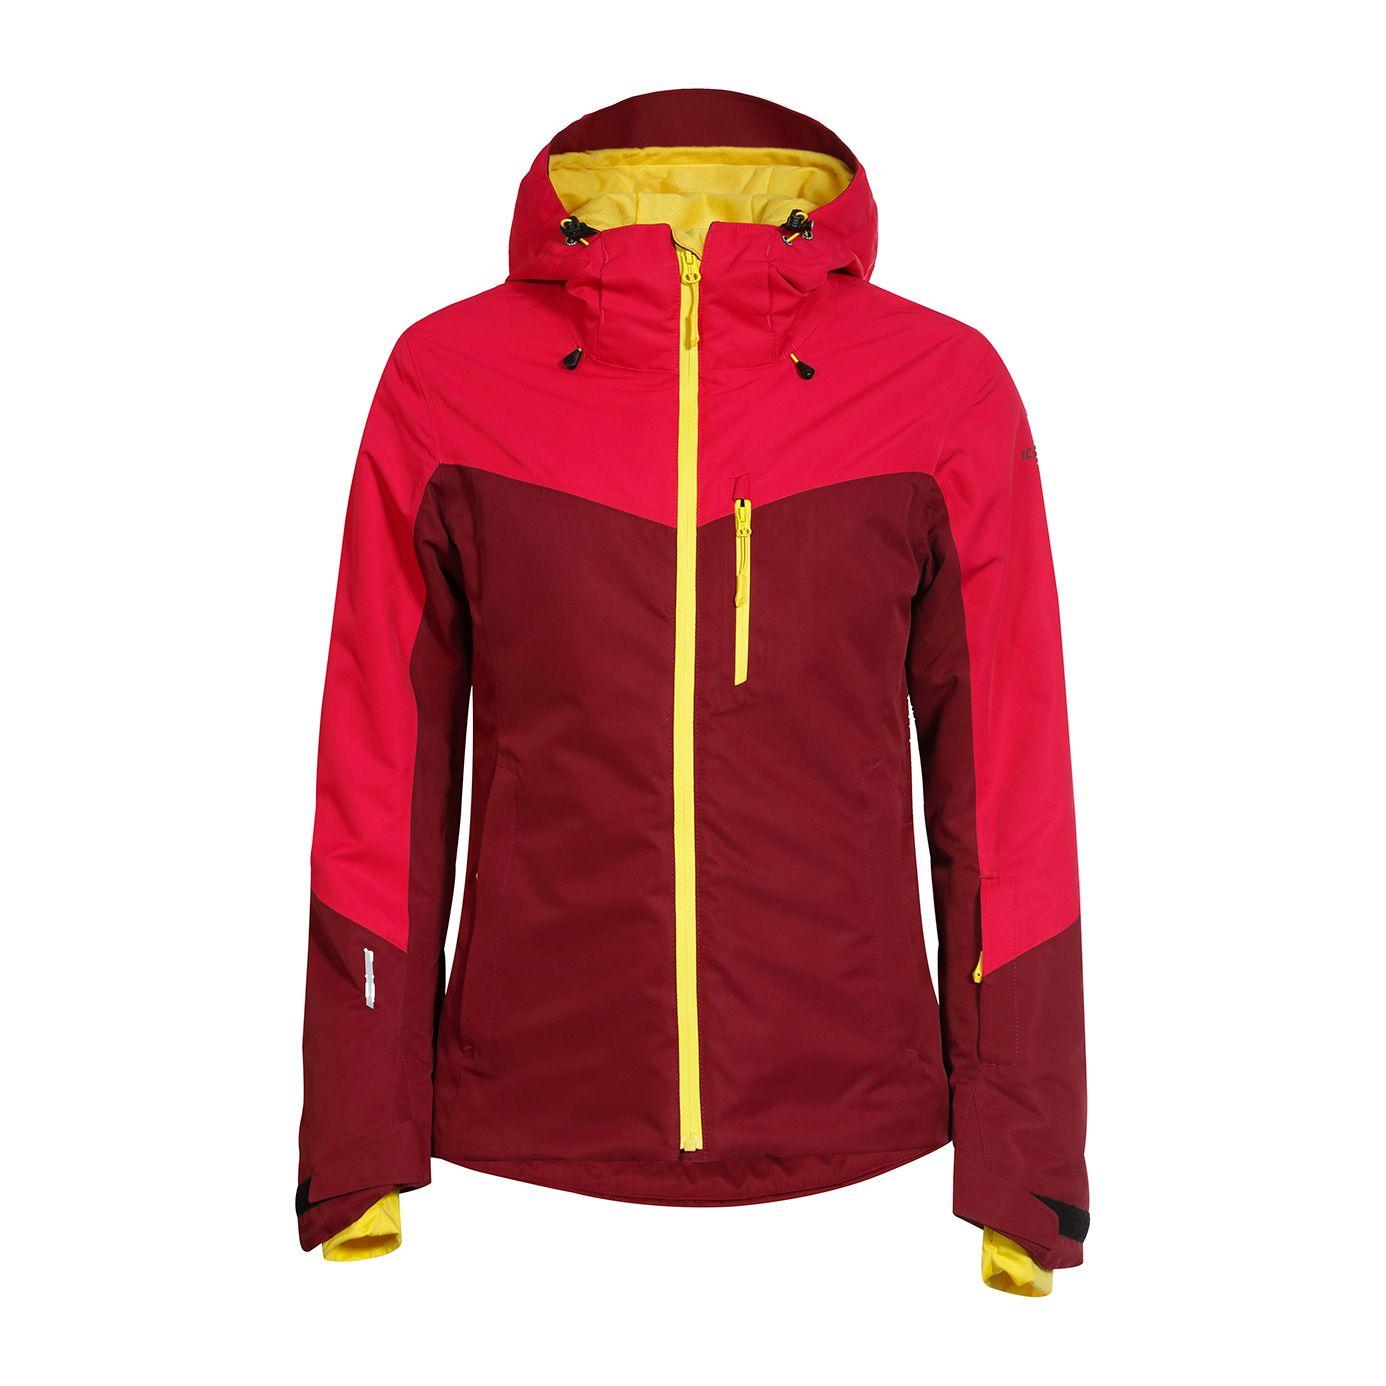 Kate Jackets Great Icepeak Womens Jacket OutdoorsSki OPkXiuZ